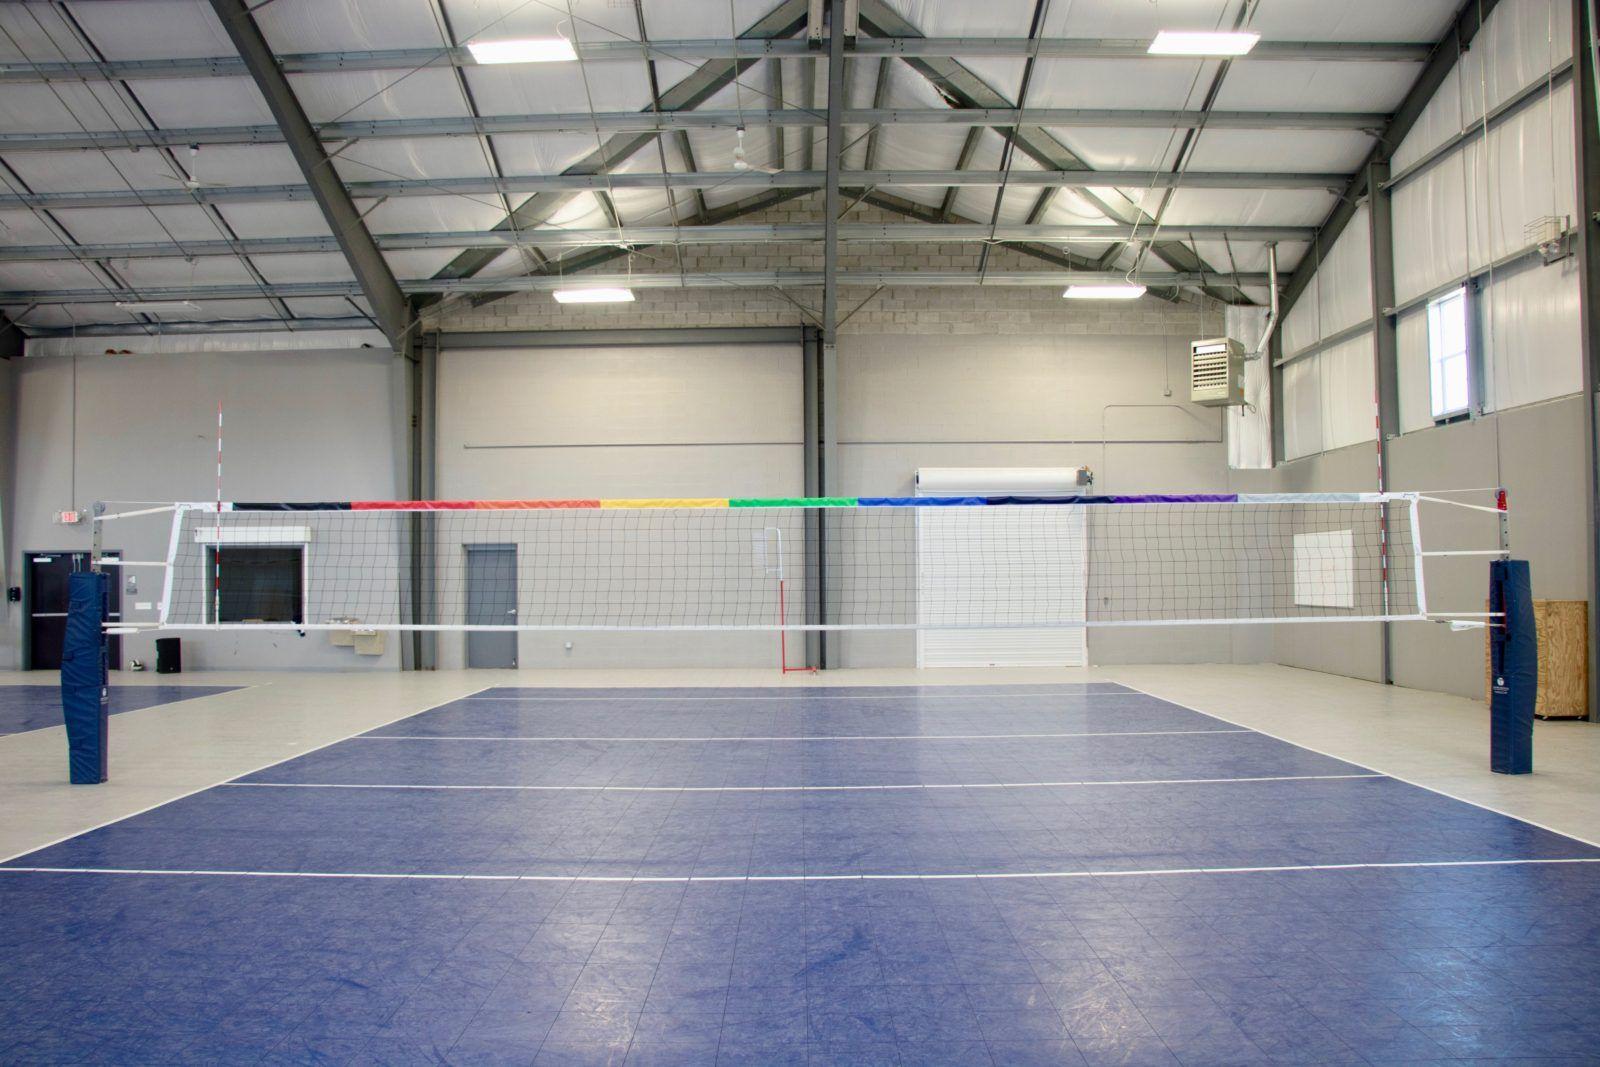 Training Top Net Tape Volleyball Training Volleyball Equipment Training Tops